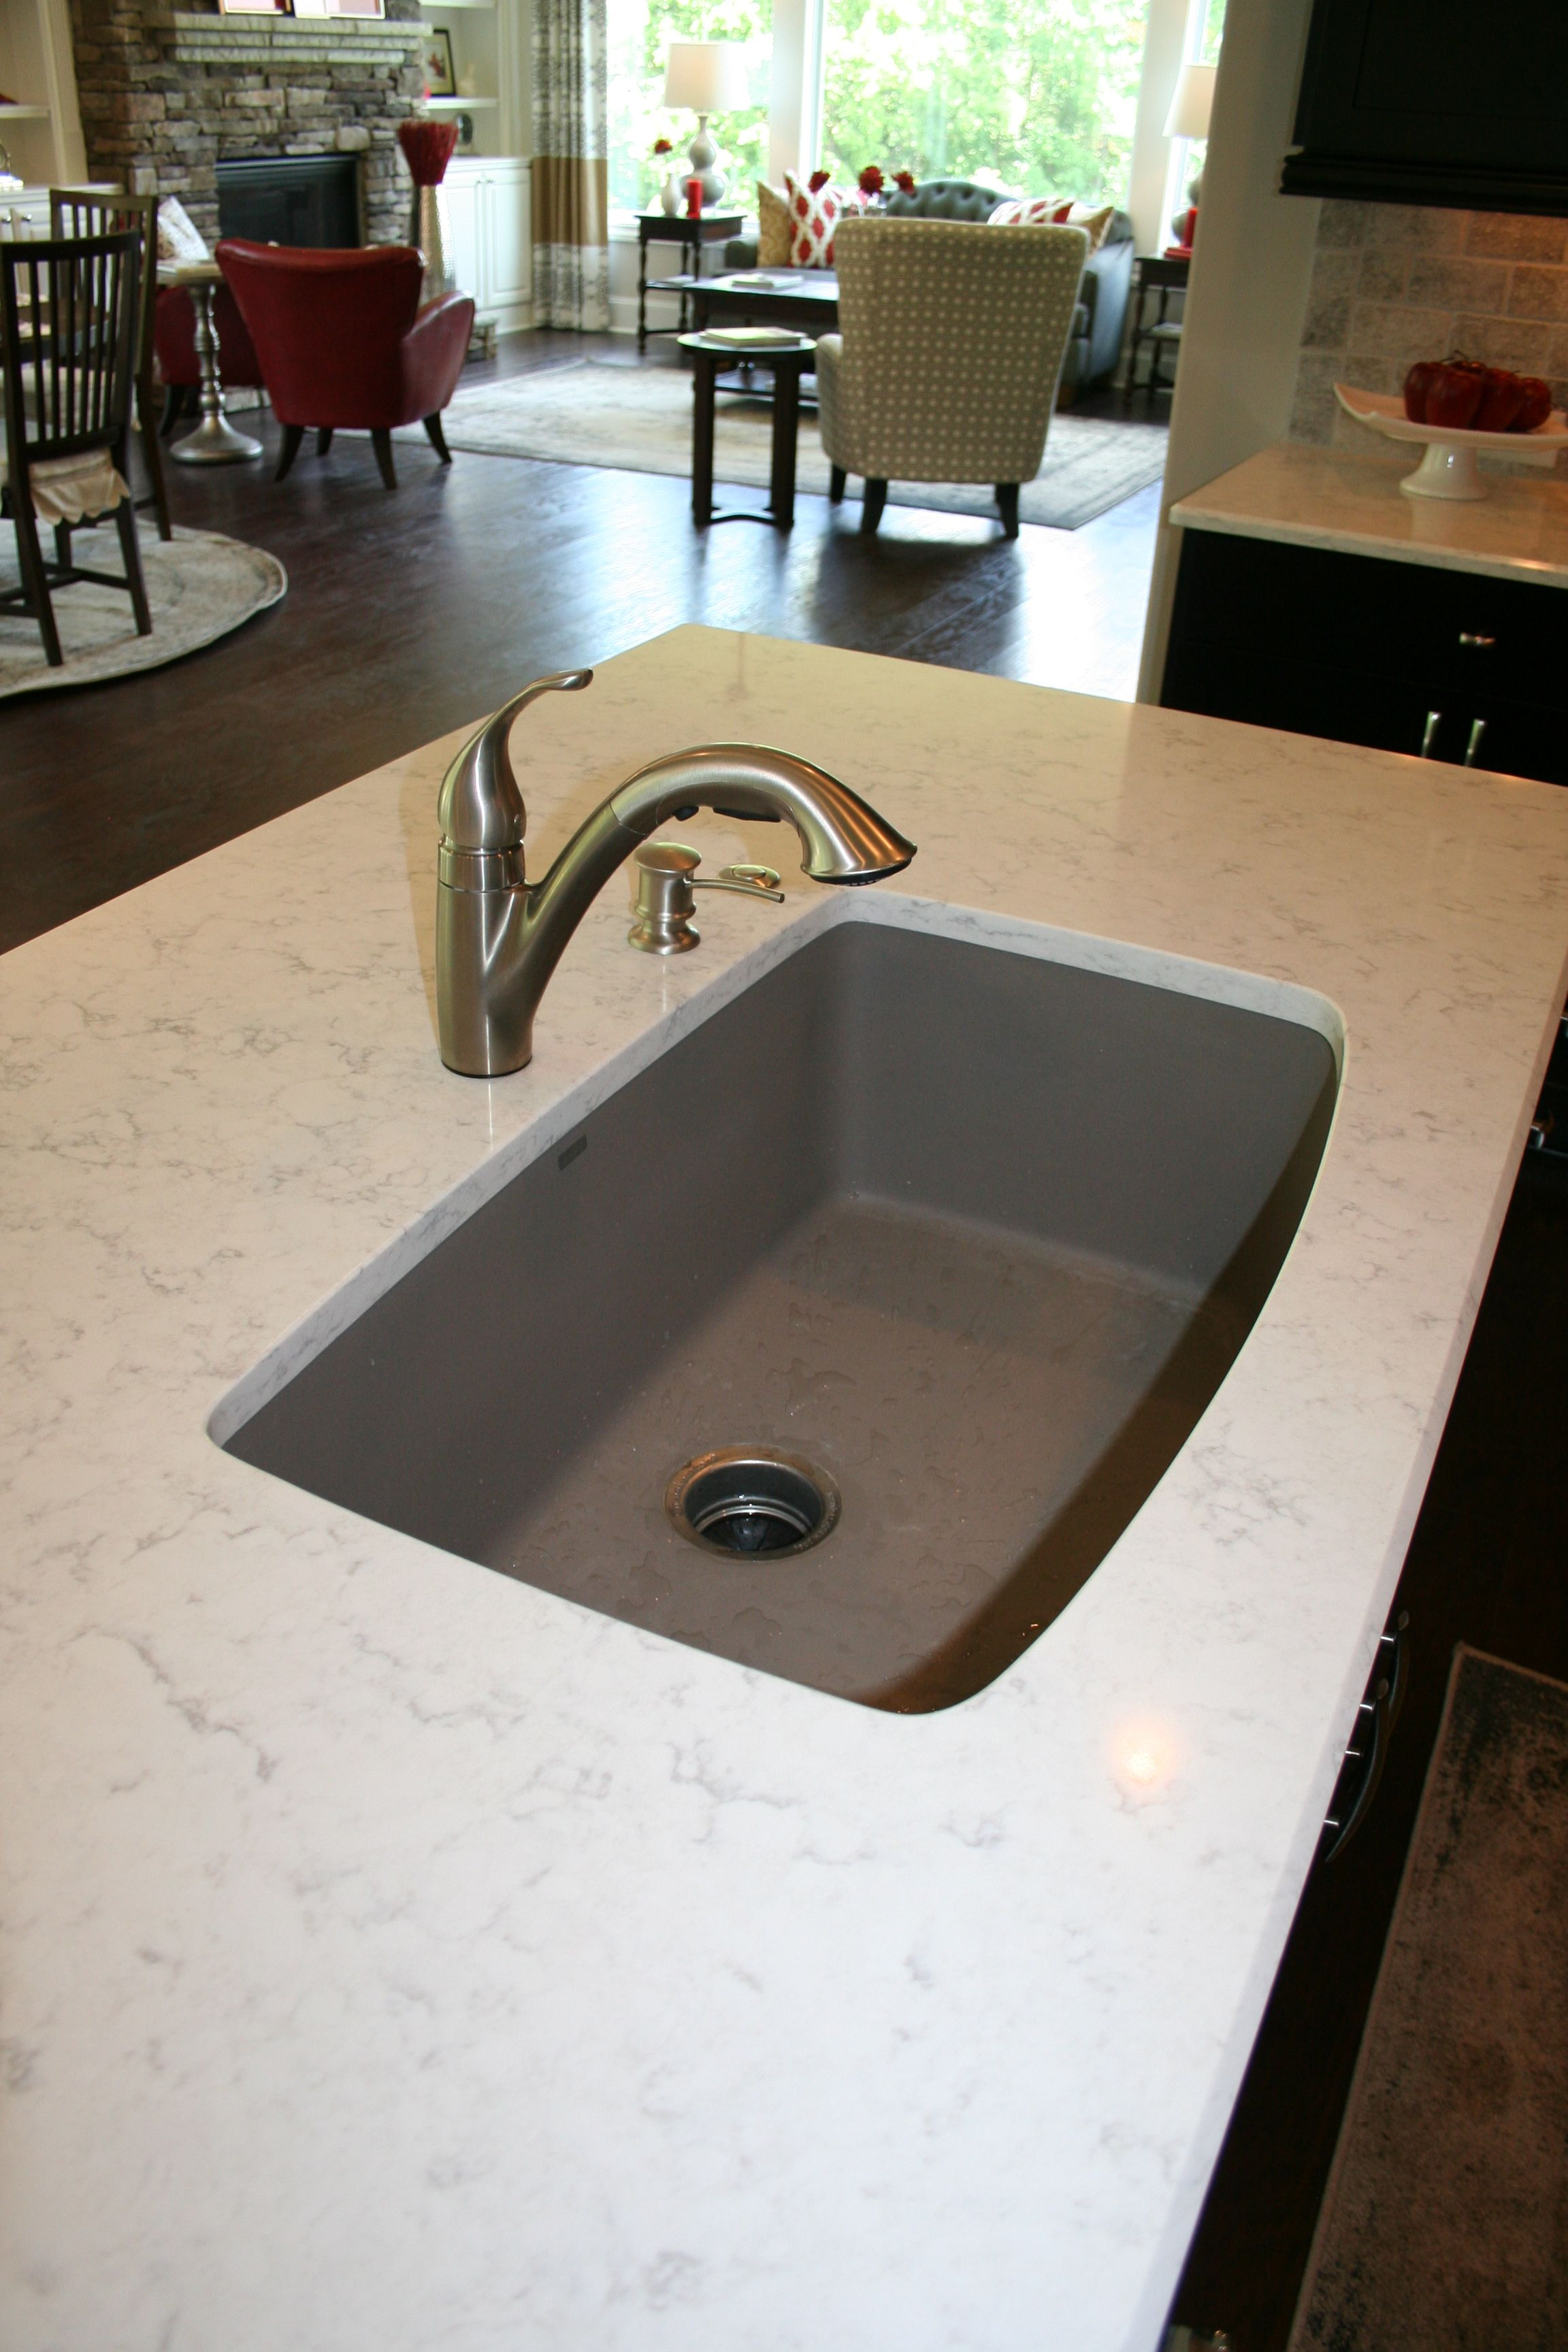 Download Wallpaper How To Install Drop In Sink On Quartz Countertop